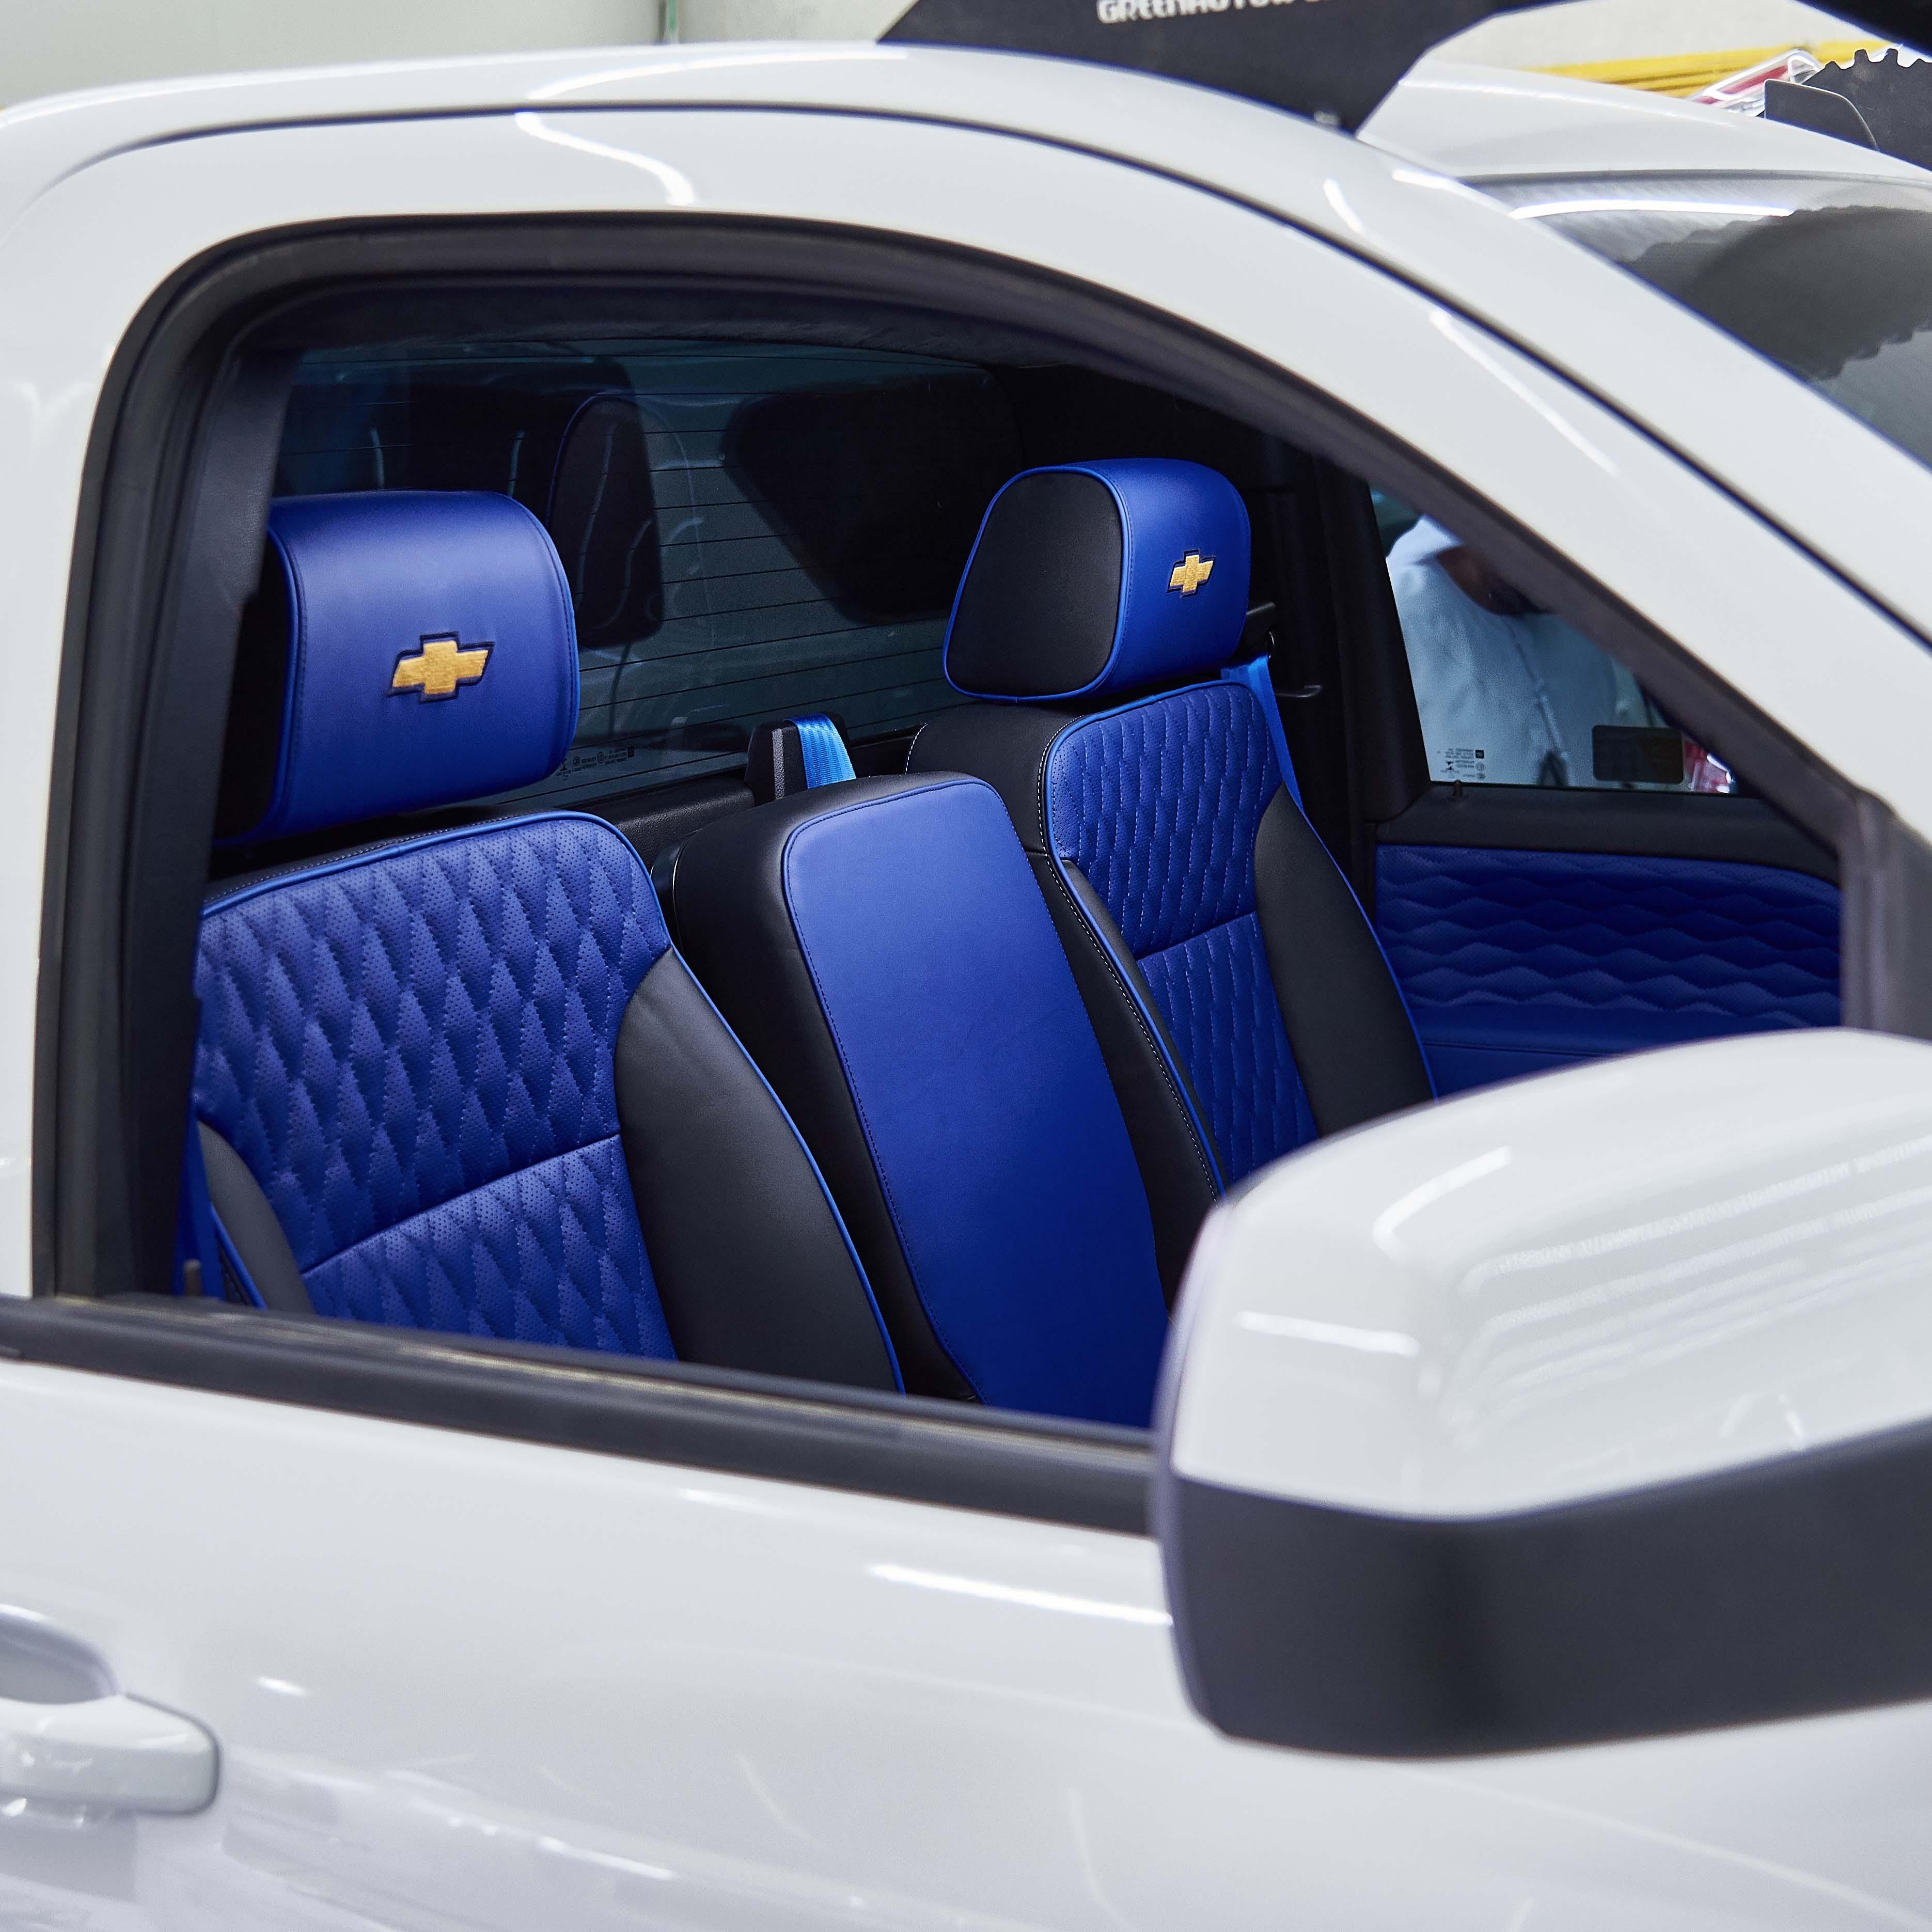 Lamst Fn Upholstery Cars - Car Upholstery - Carnity.com